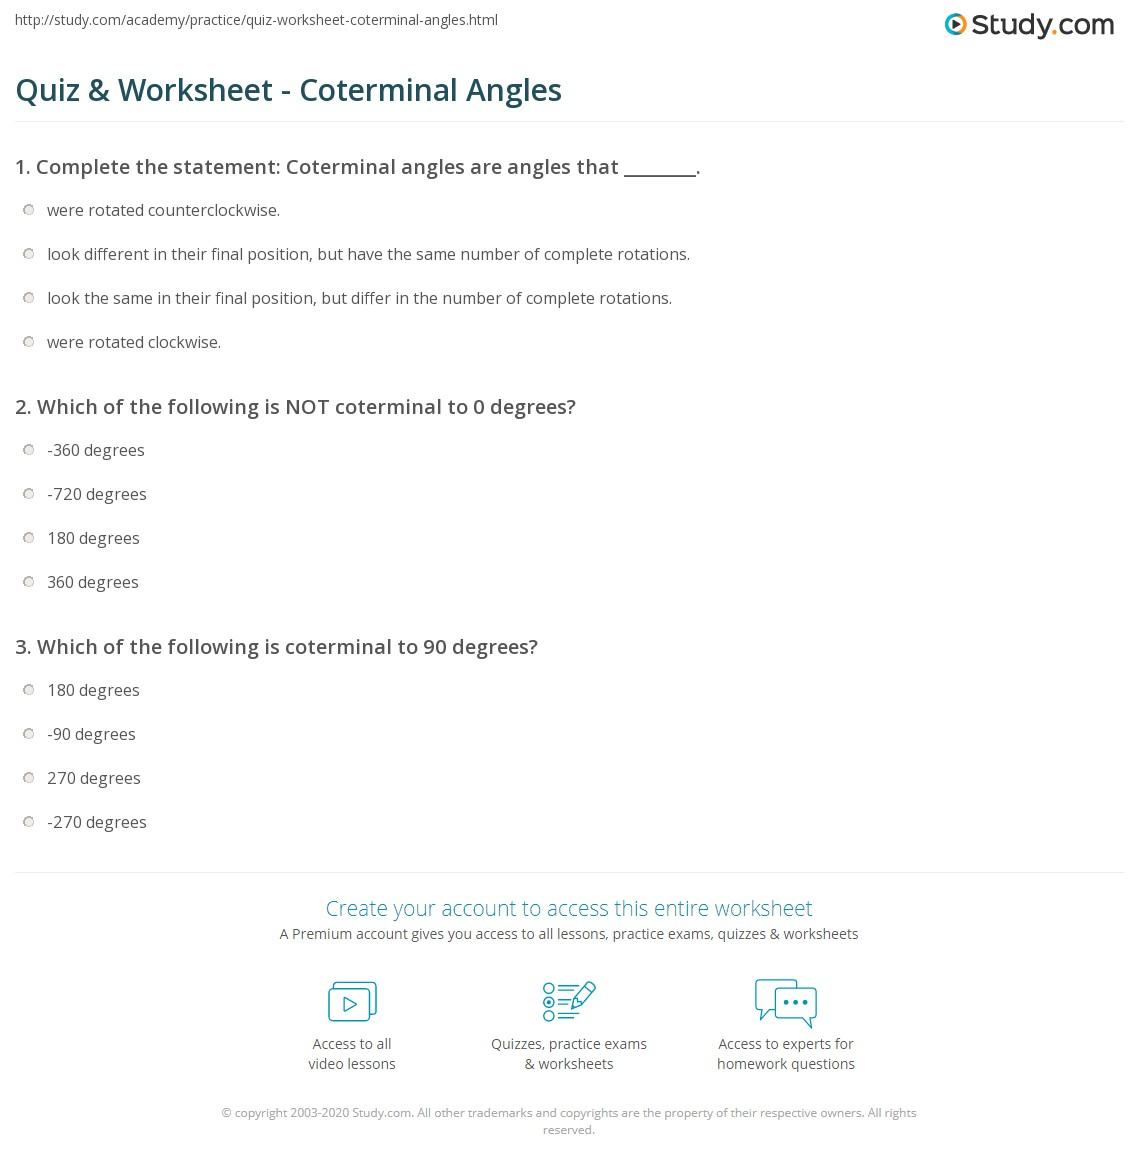 Quiz Worksheet Coterminal Angles Study Com